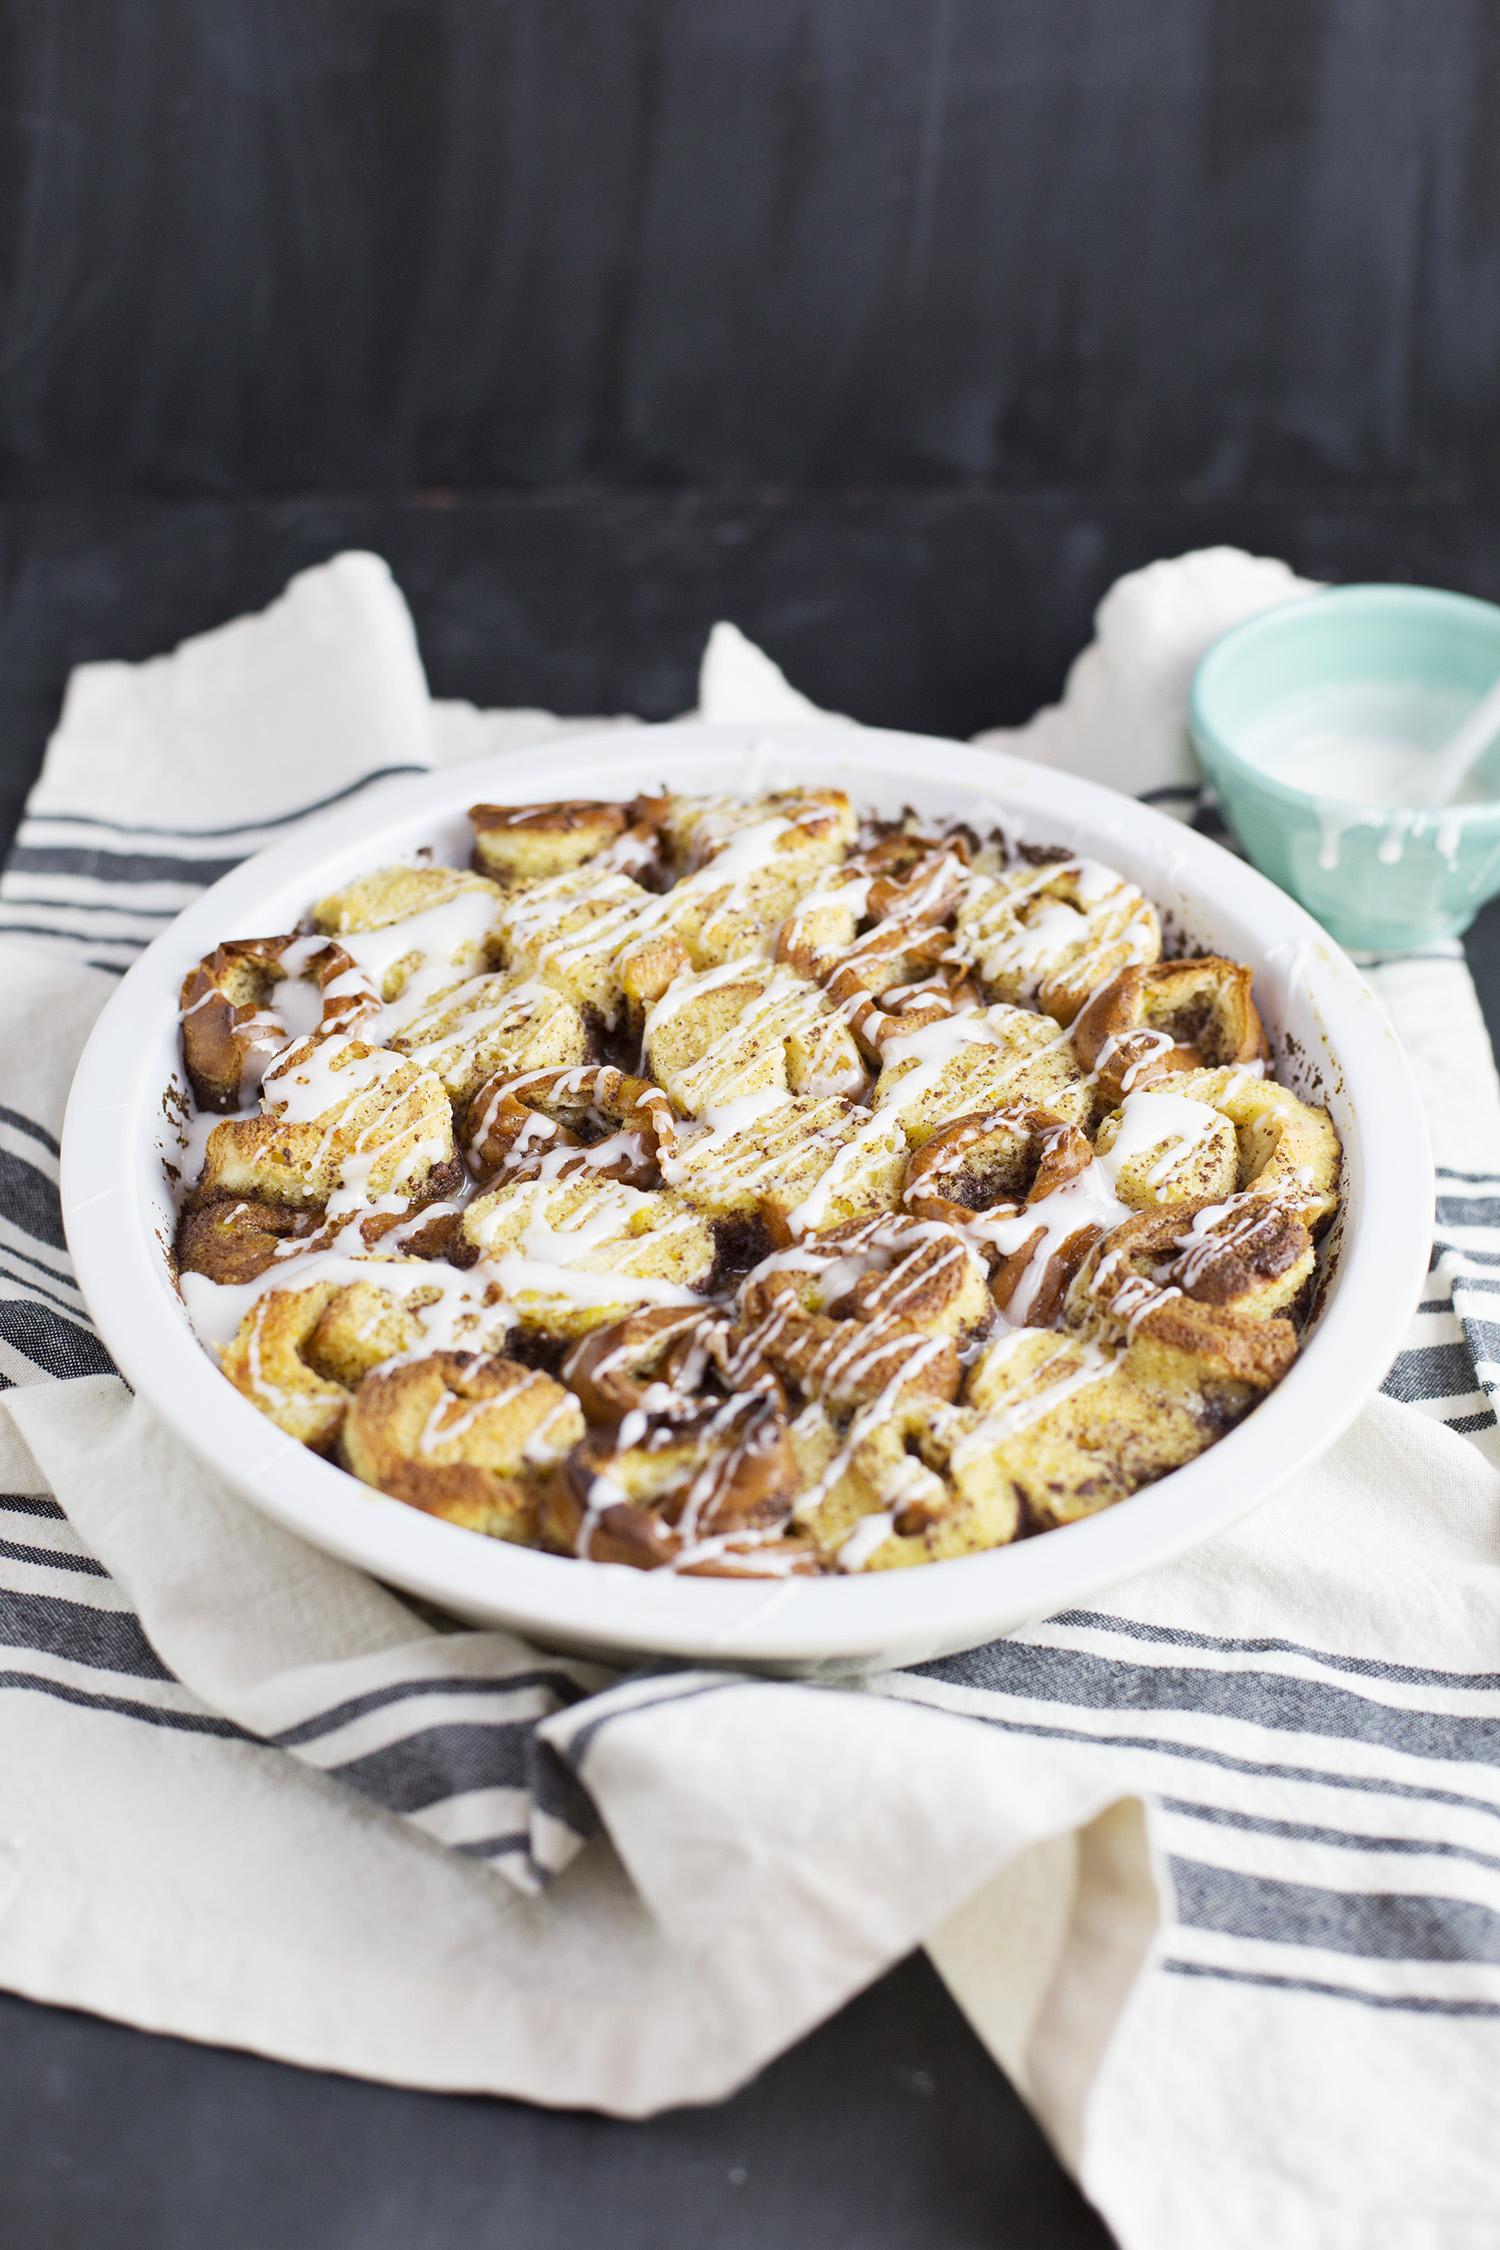 Cinnamon Roll Casserole (via abeautifulmess.com)